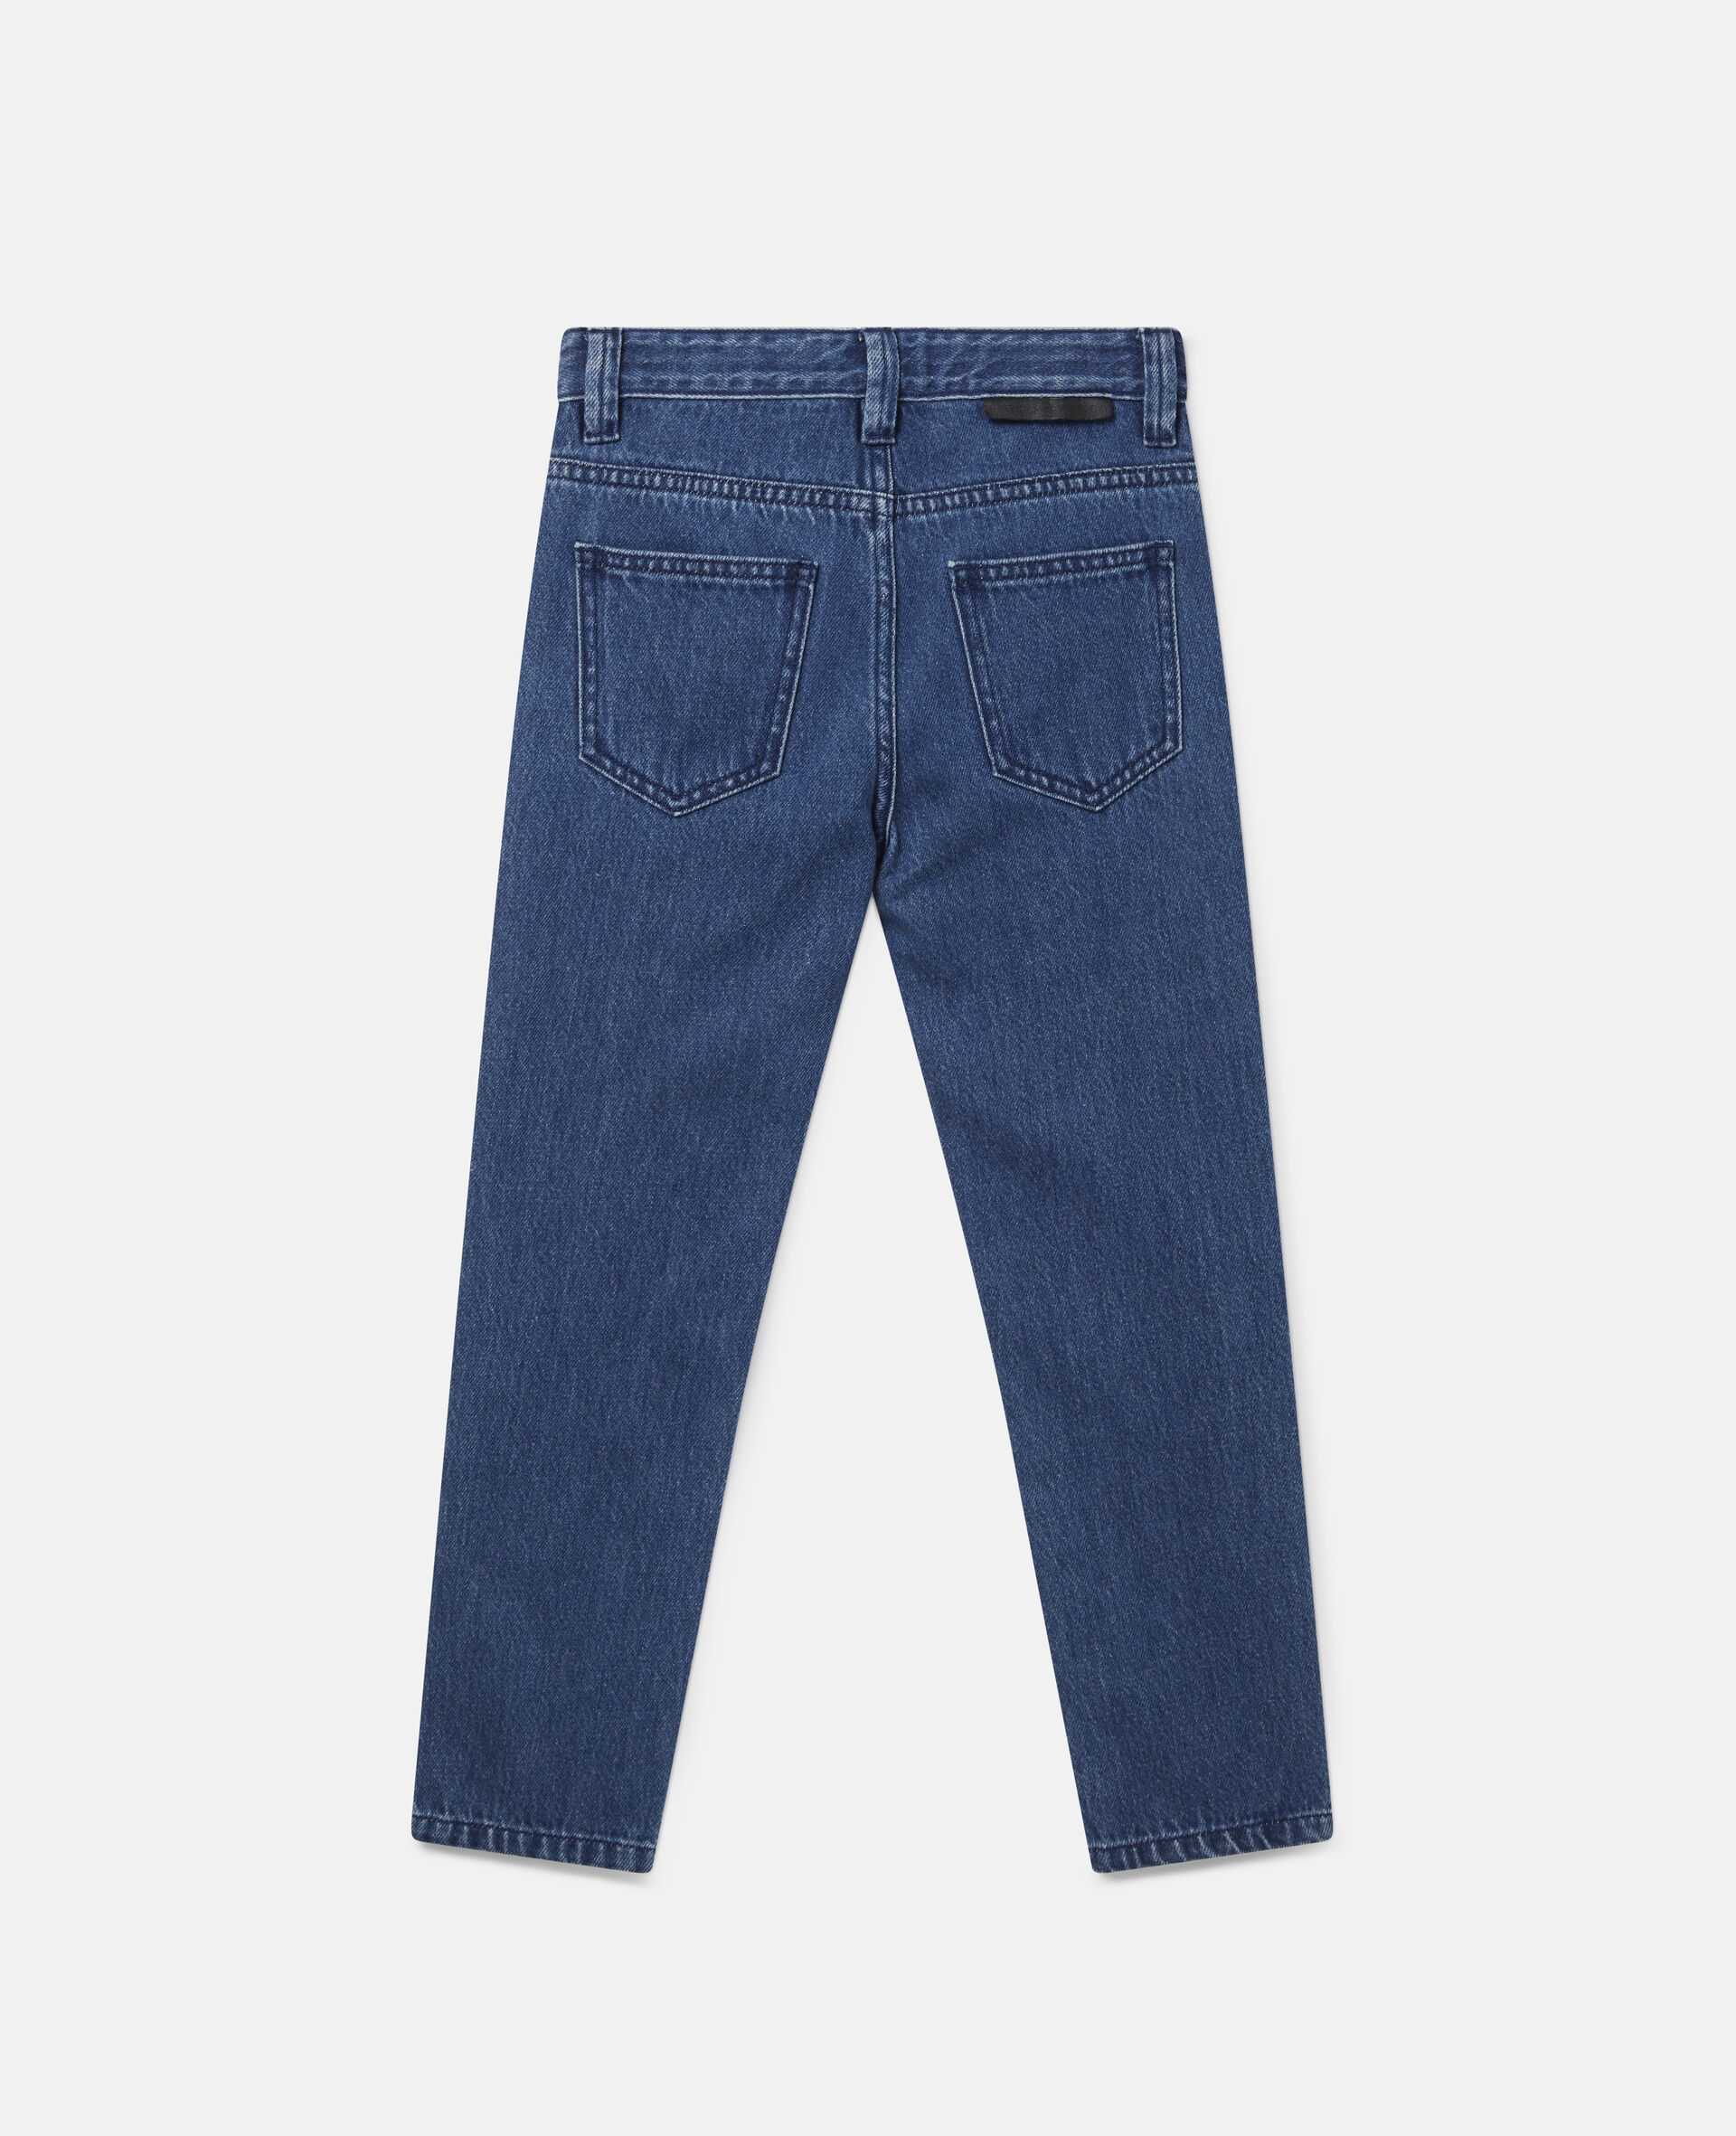 Denim Trousers-Blue-large image number 2